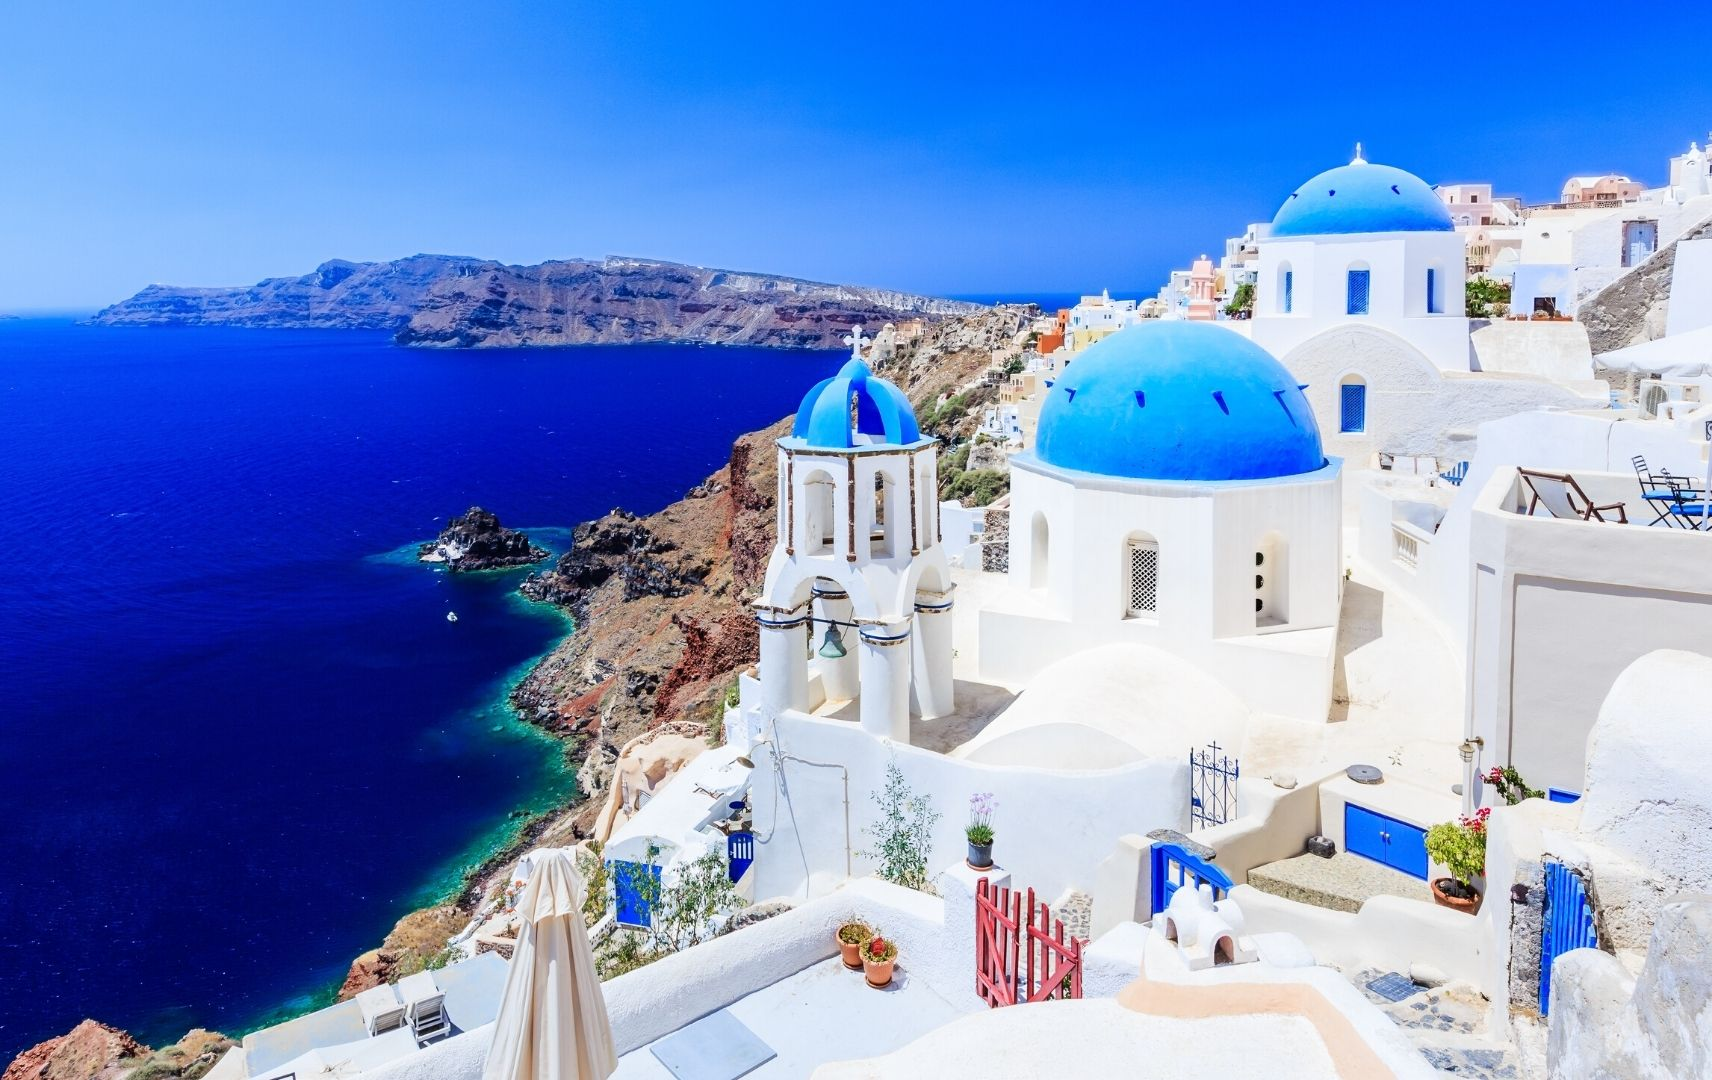 Reiseziel - Griechenland Stadt am Meer